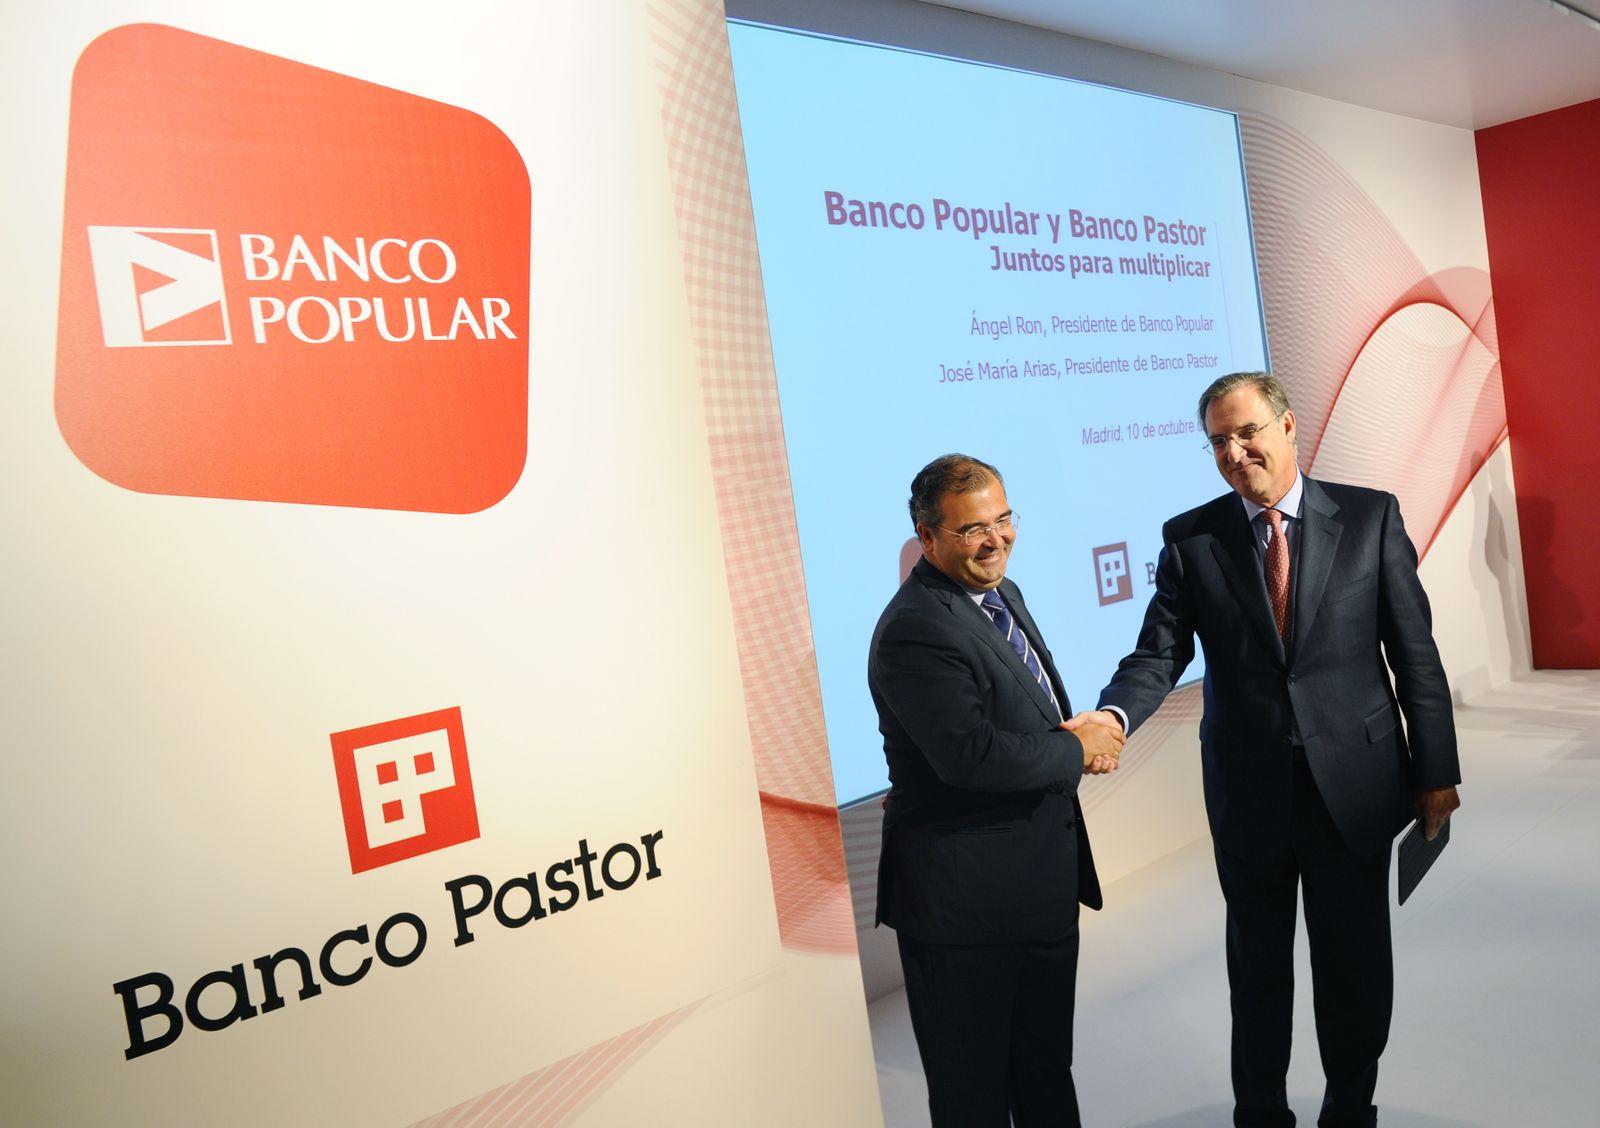 Banco Popular / Spanien